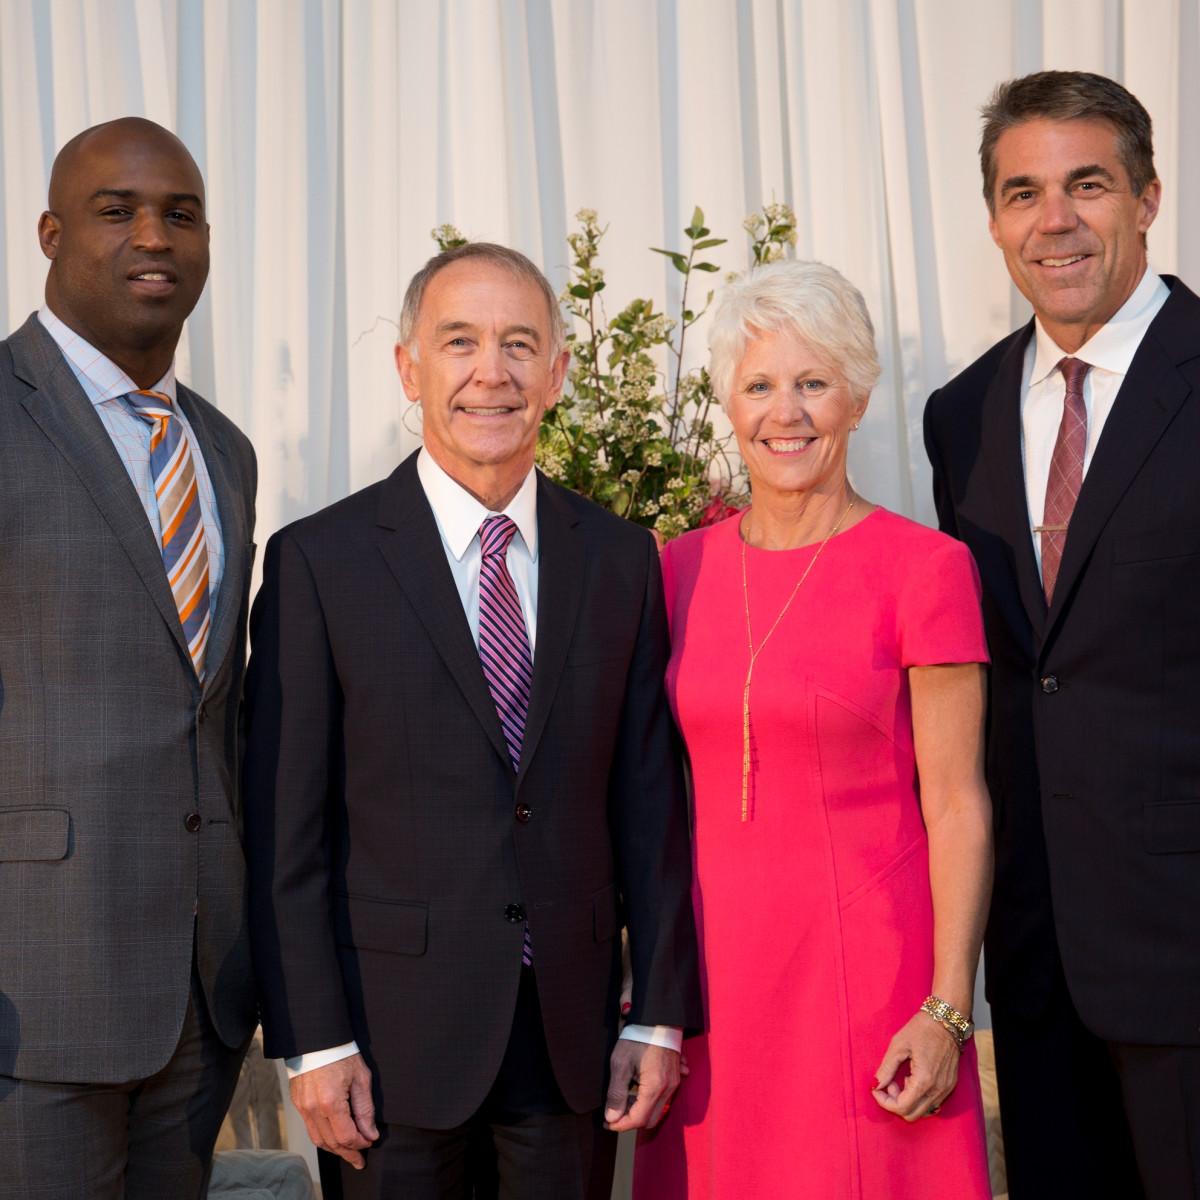 Houston, Menninger Clinic Annual Luncheon, May 2016, Ricky Williams, Dr. C. Edward Coffey, Kathy Coffey, Chris Fowler